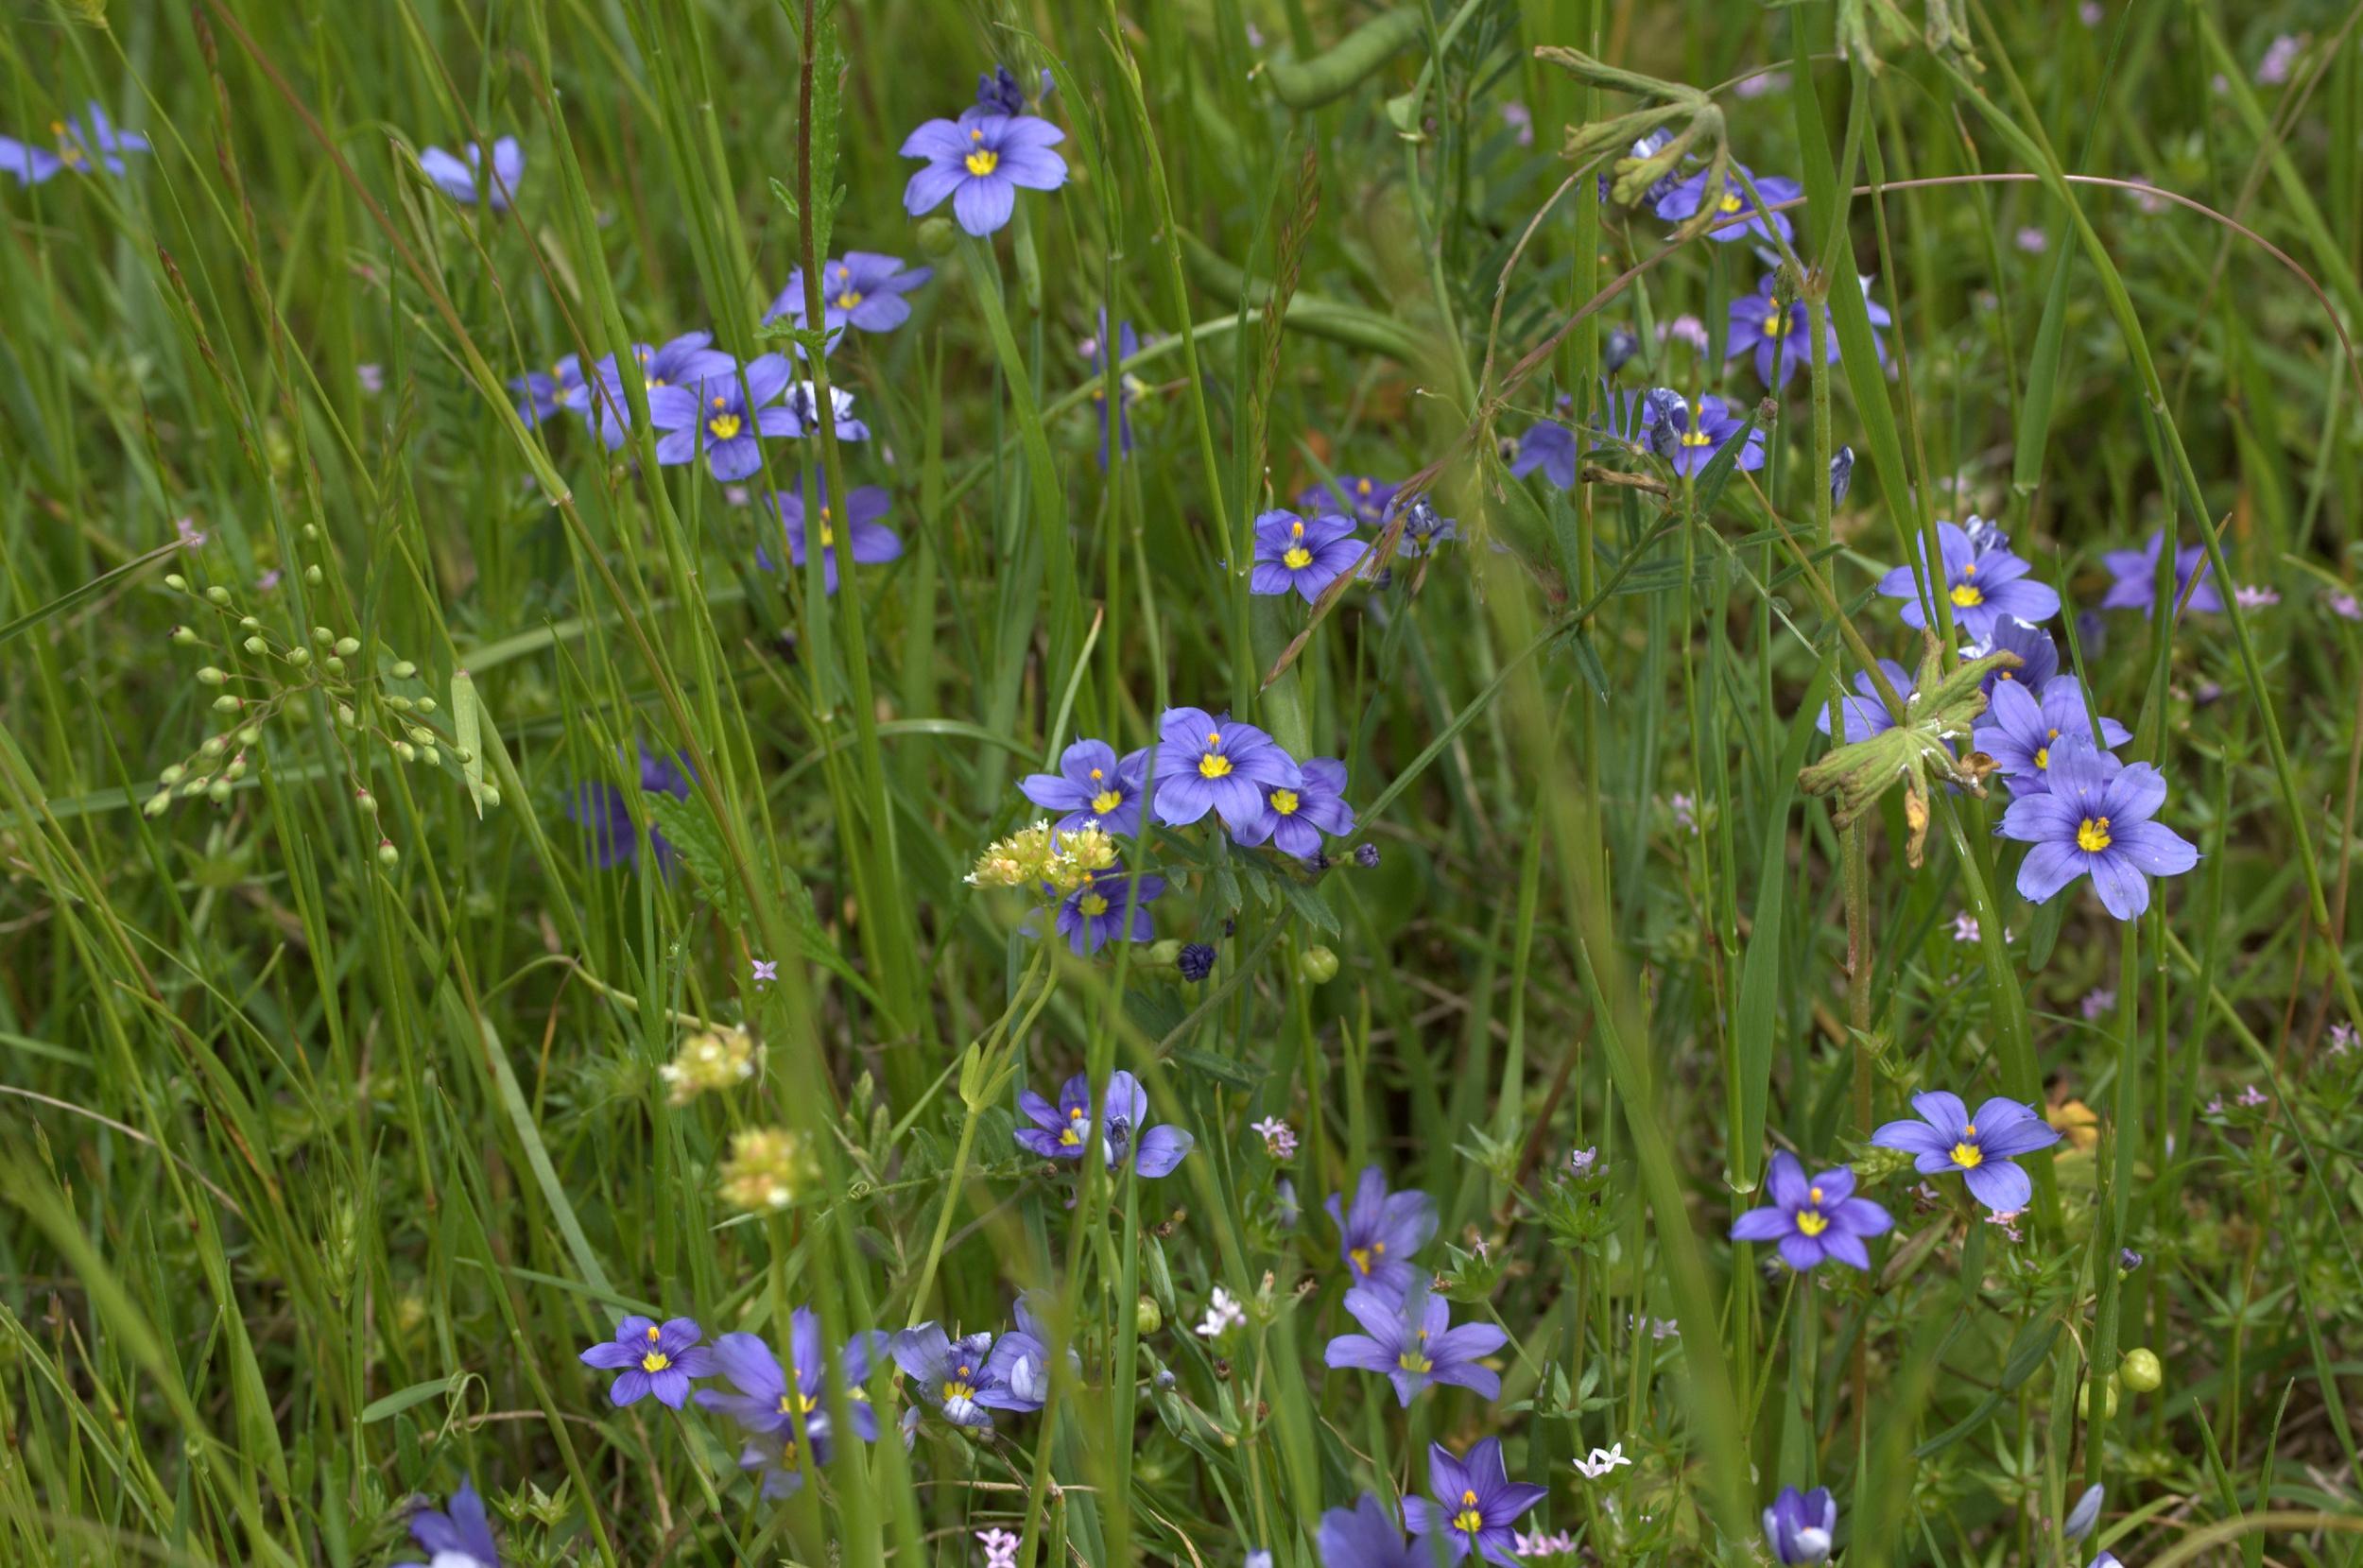 Sisyrinchium angustifolium, Blue Eyed Grass